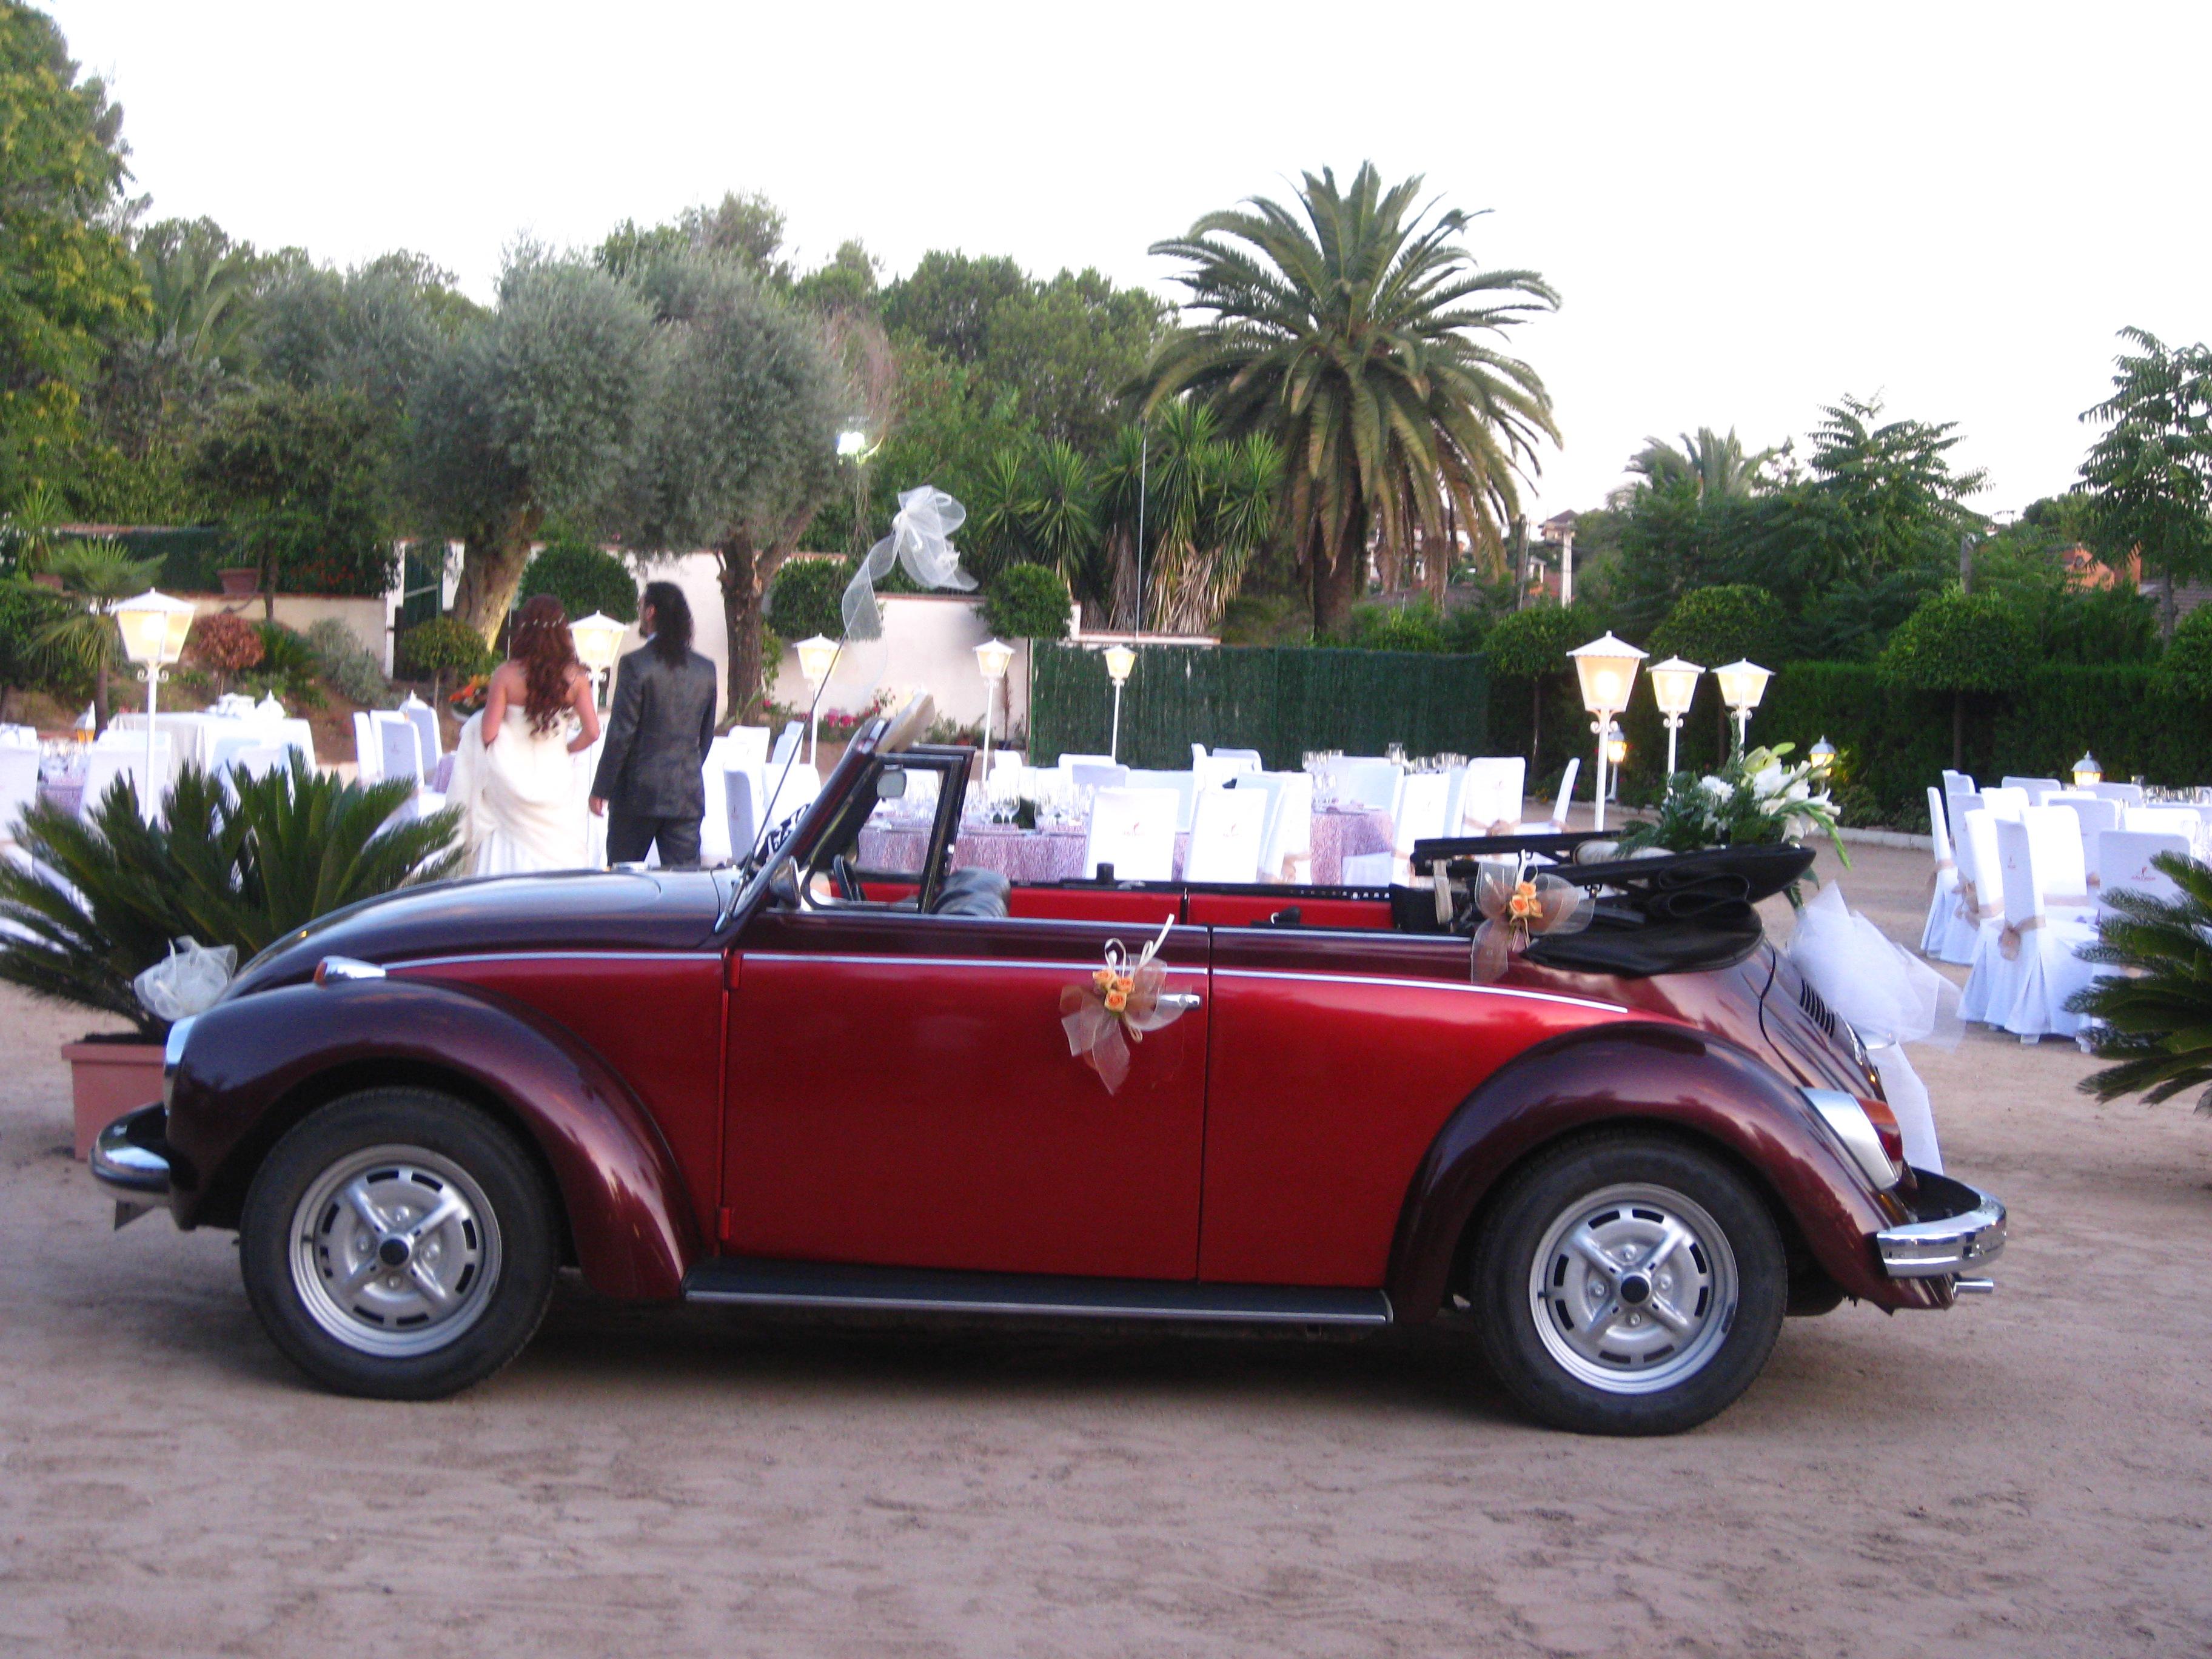 I loved the car.